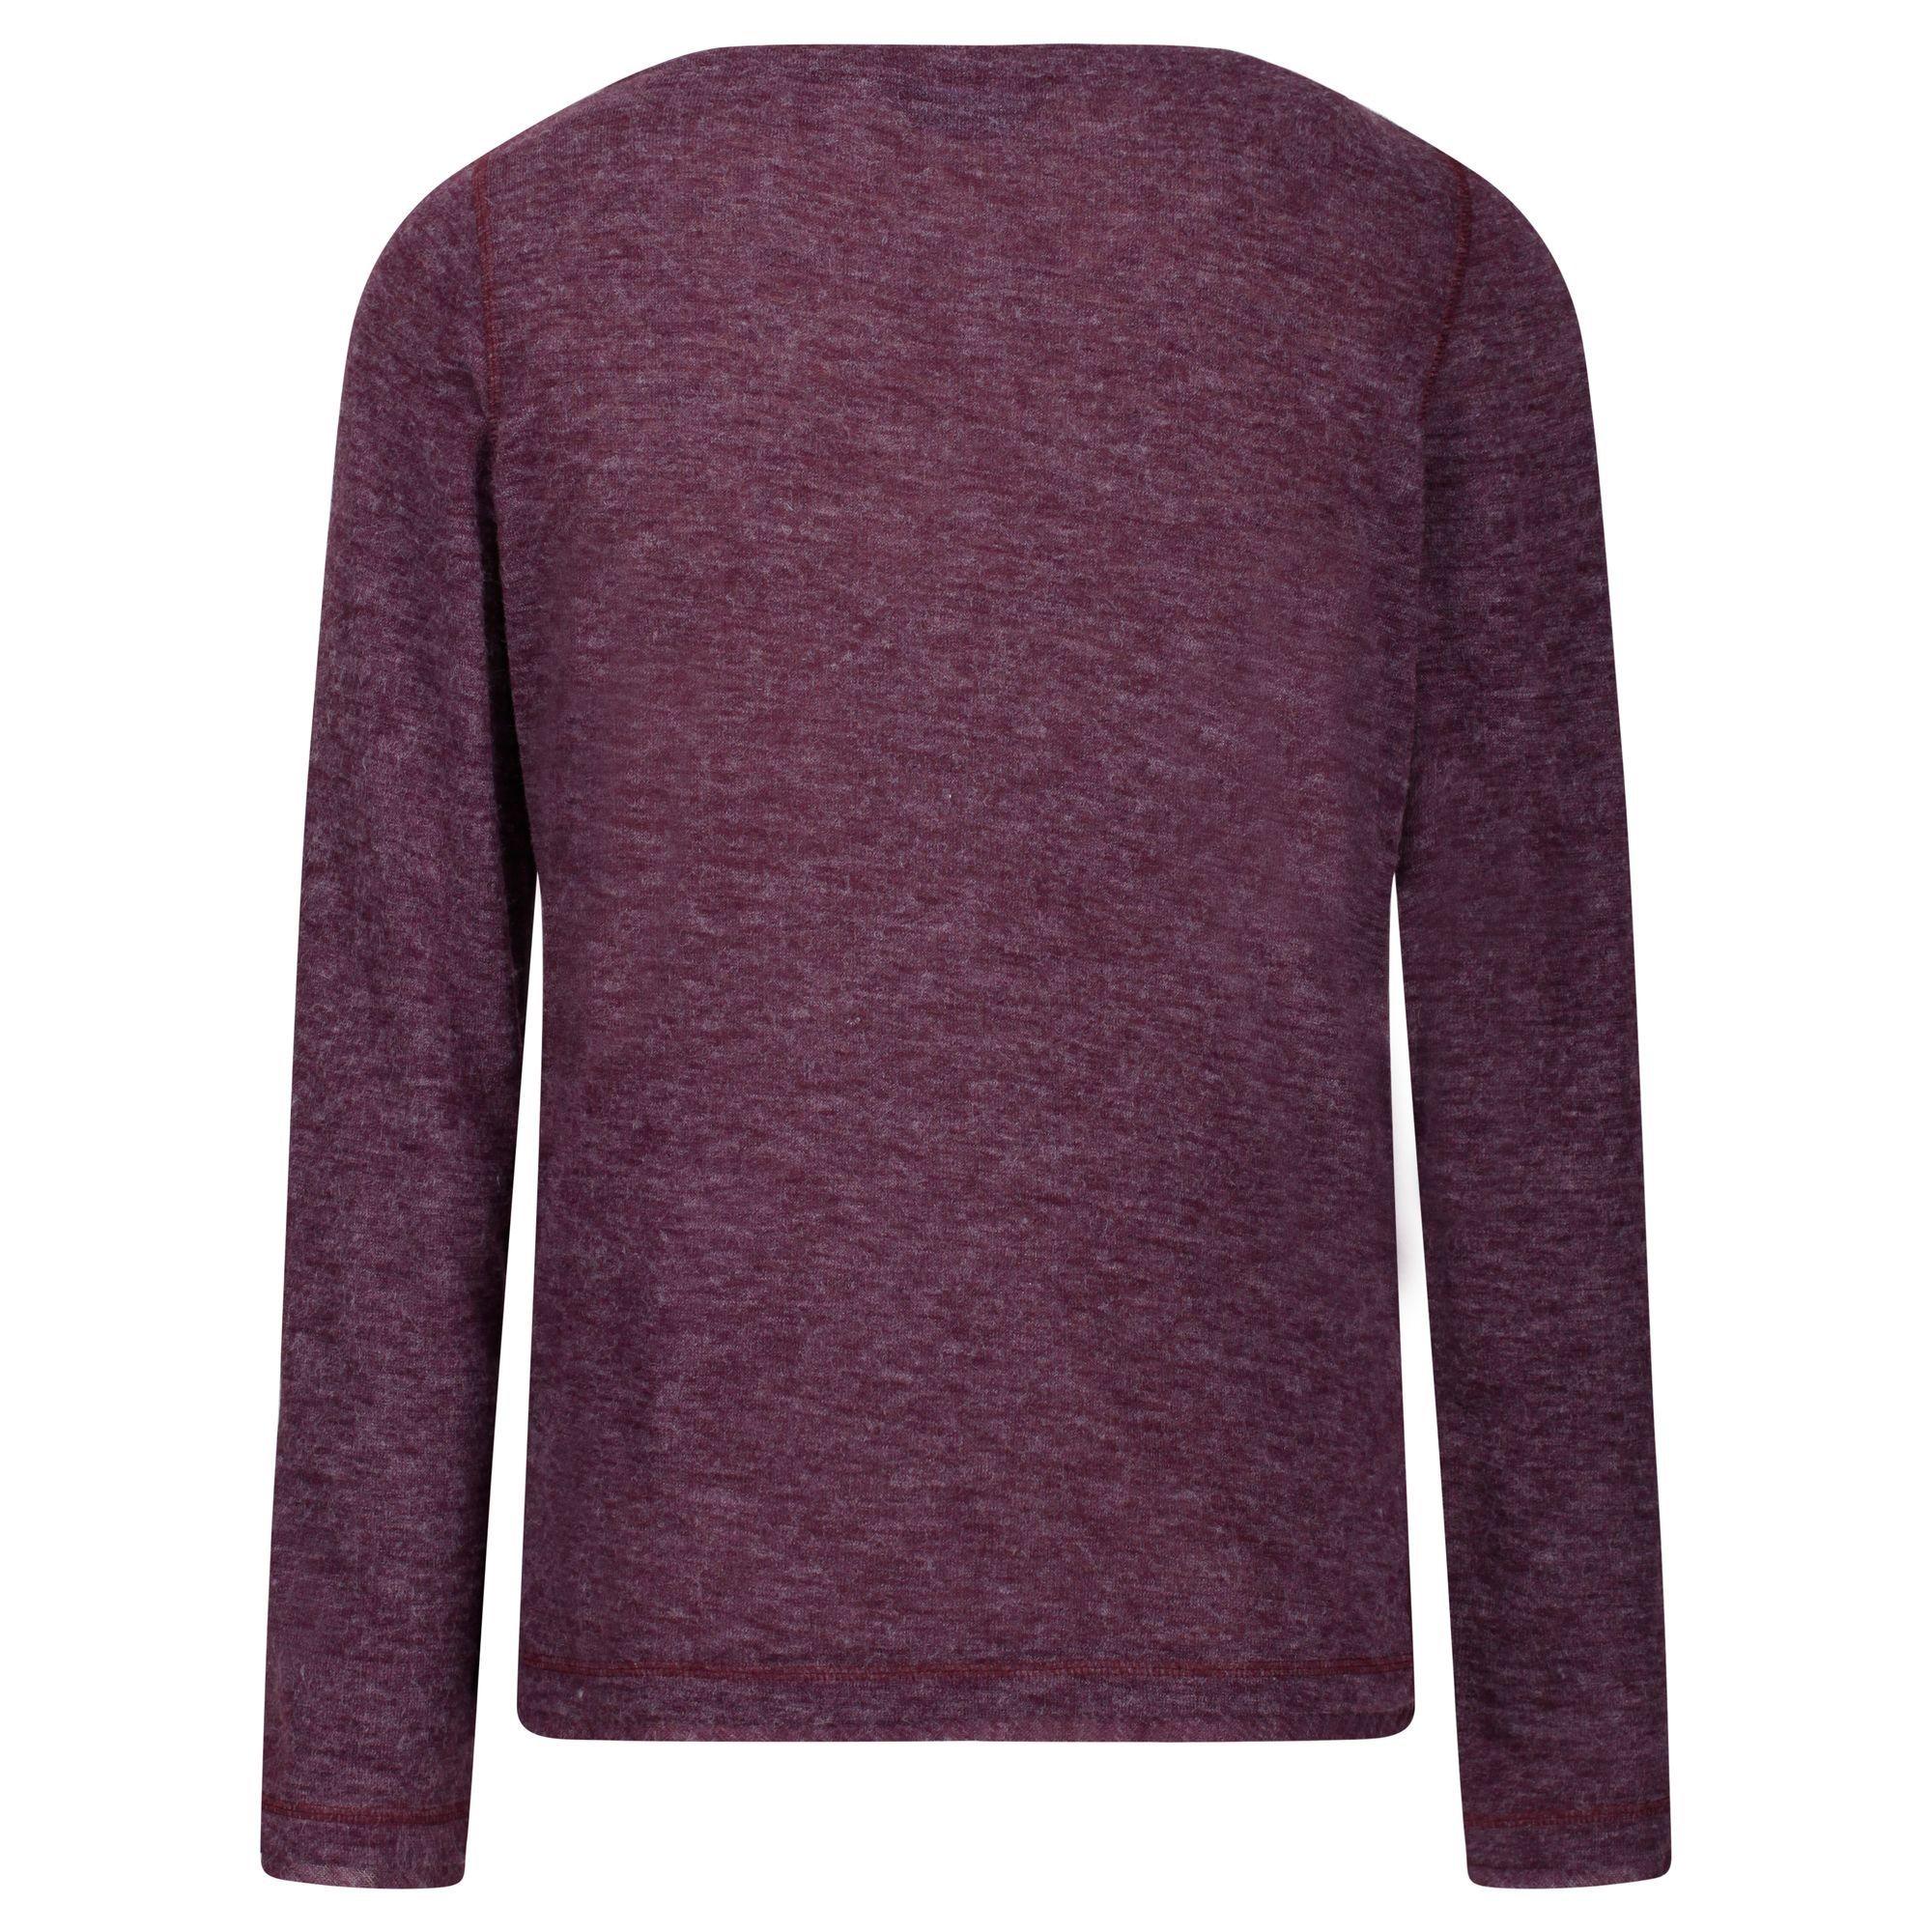 Regatta Womens/Ladies Frayda Long Sleeved T-Shirt